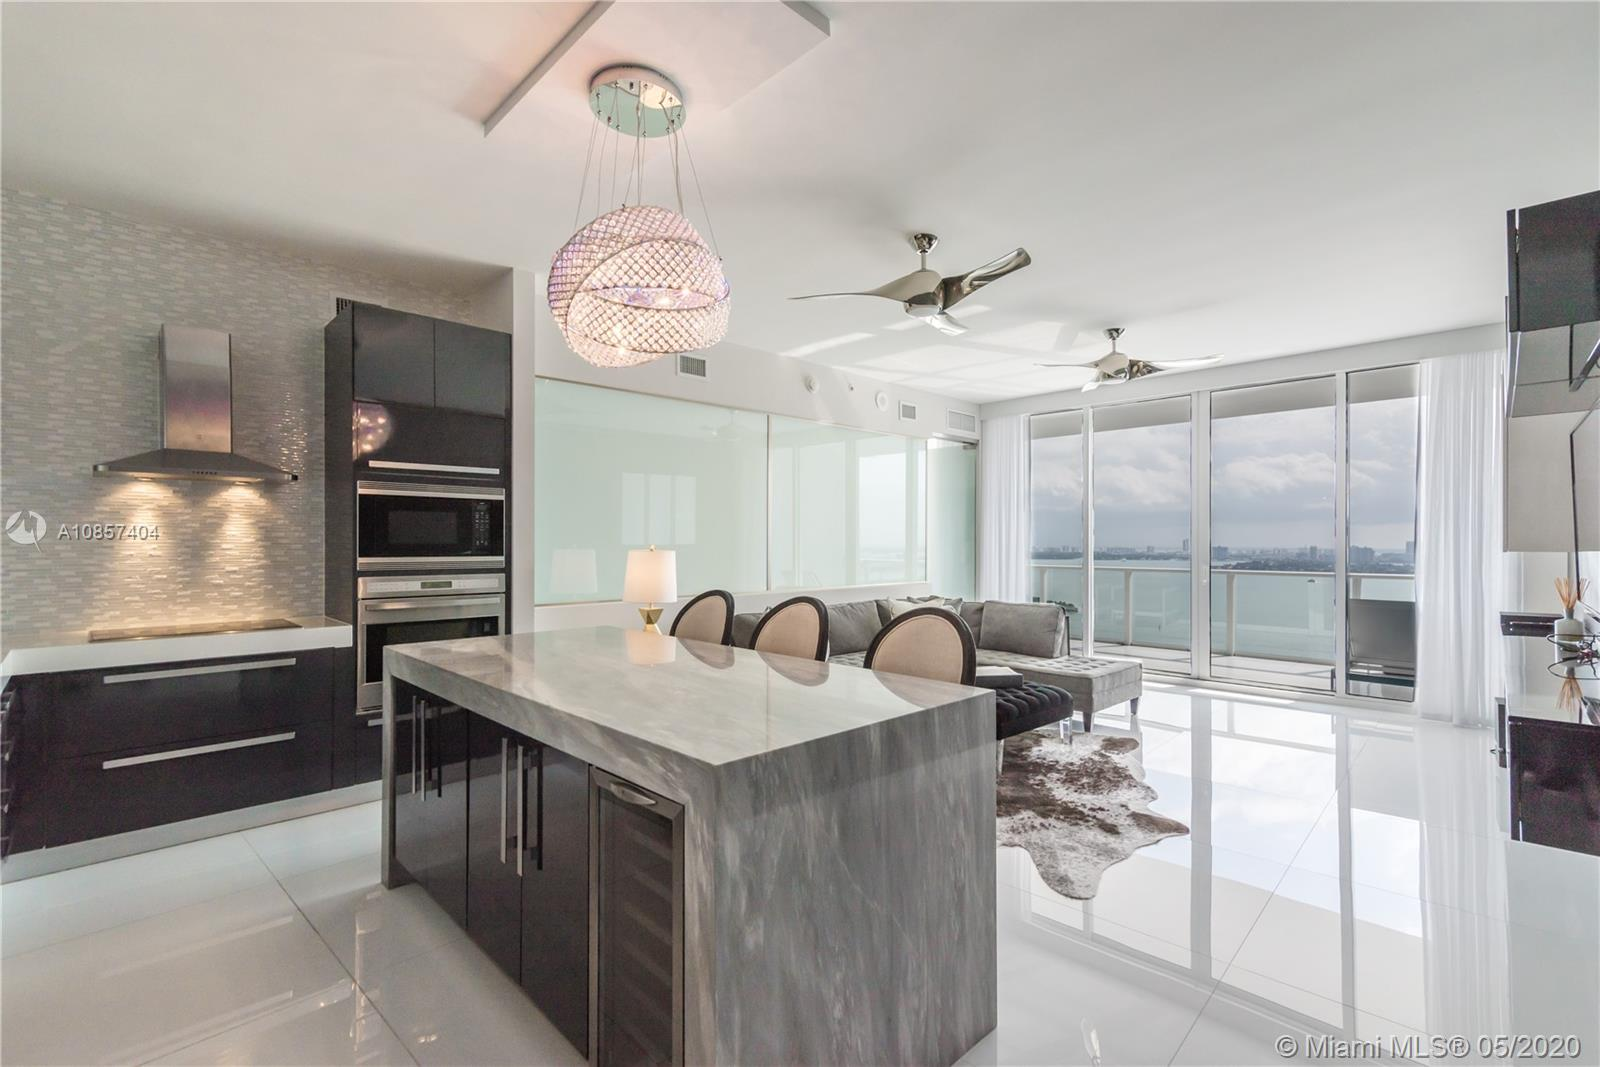 Paramount Bay #2907 - 2020 N Bayshore Dr #2907, Miami, FL 33137